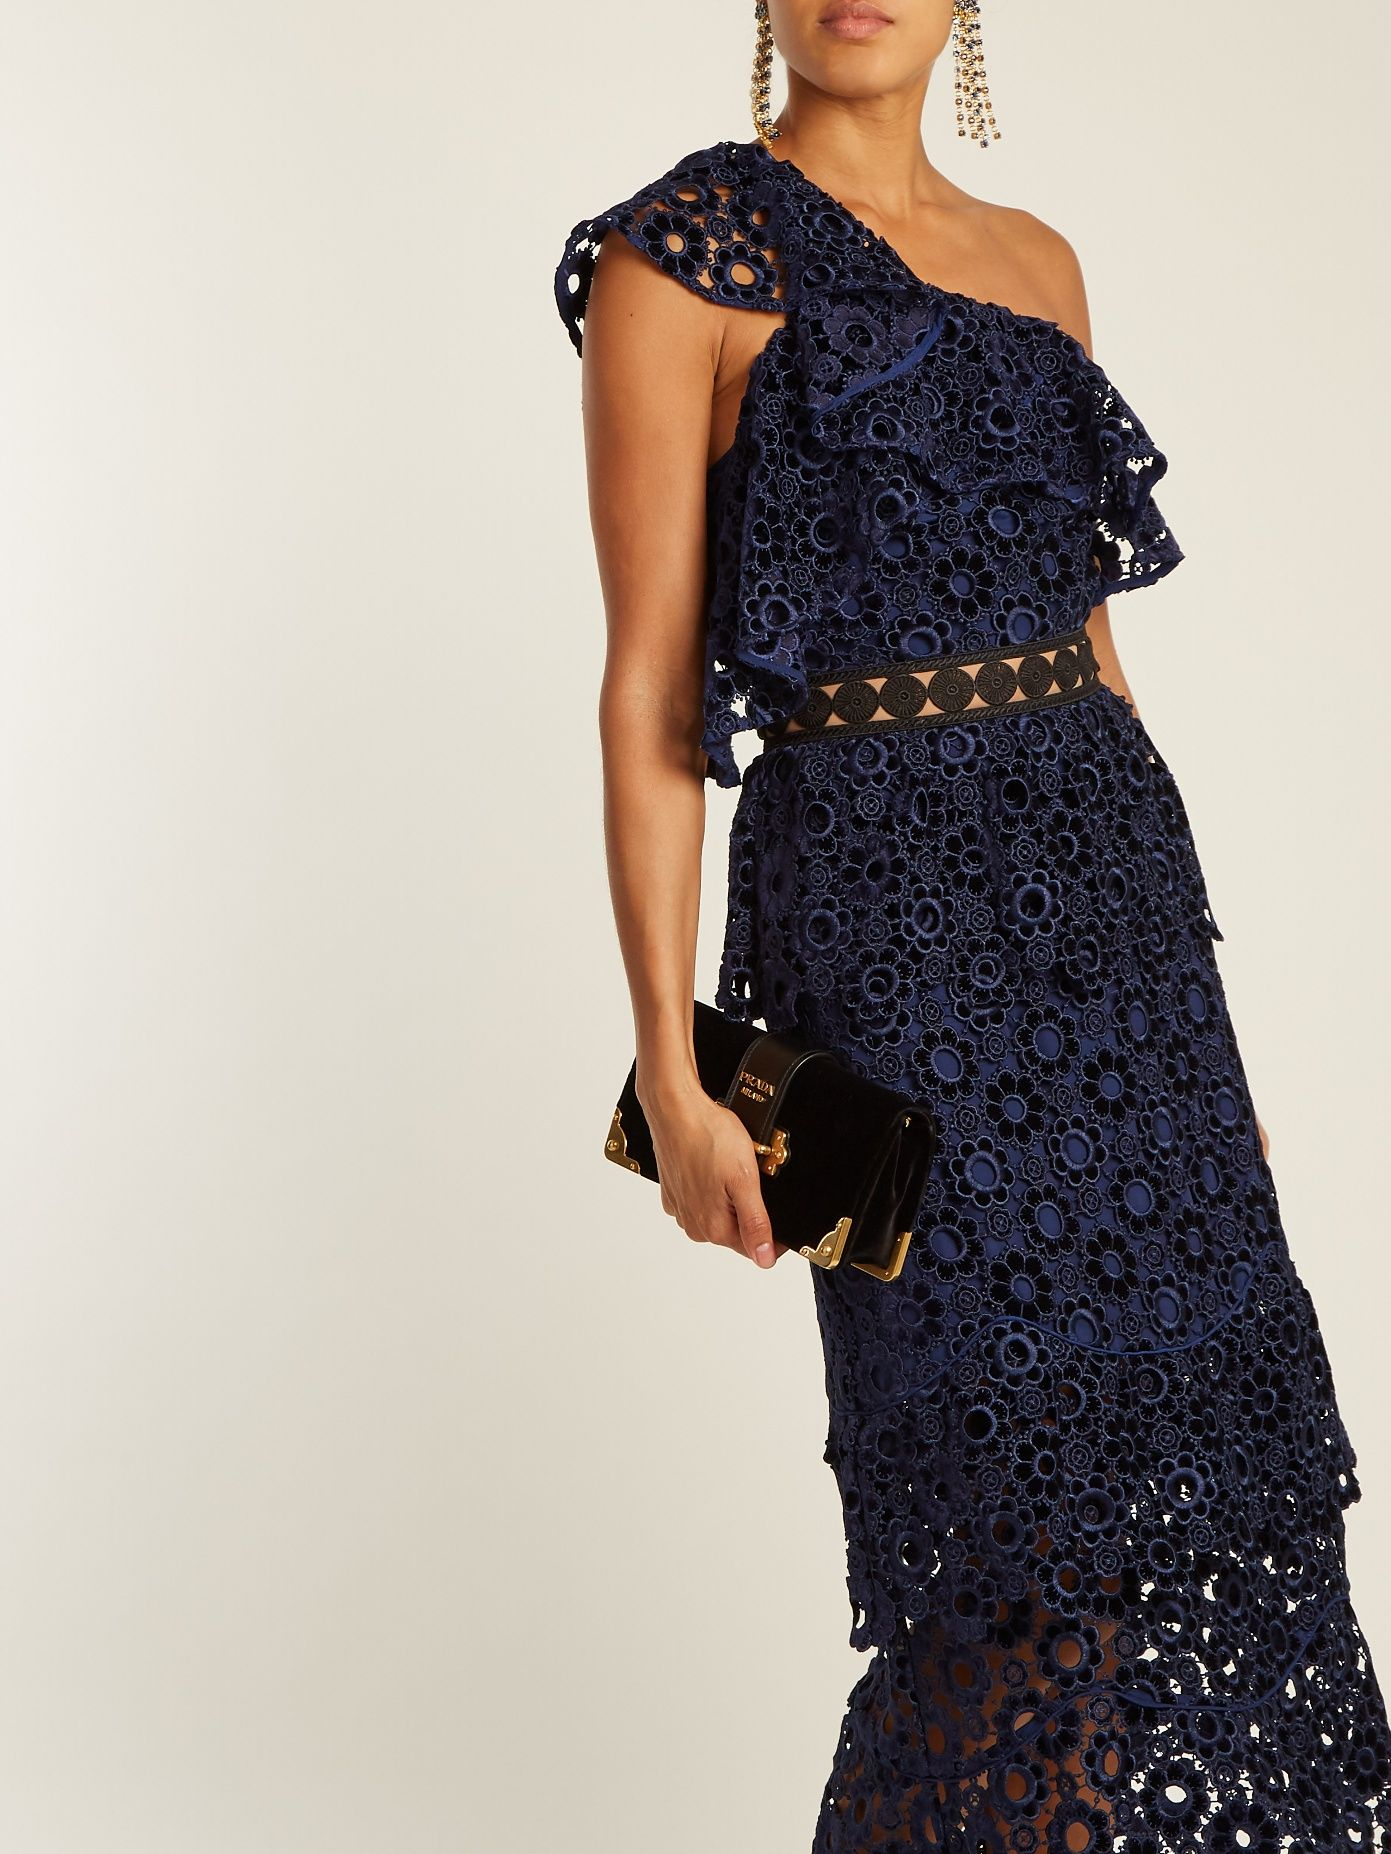 One Shoulder Tiered Floral Lace Midi Dress Self Portrait Matchesfashion Us Lace Midi Dress Dresses Midi Dress